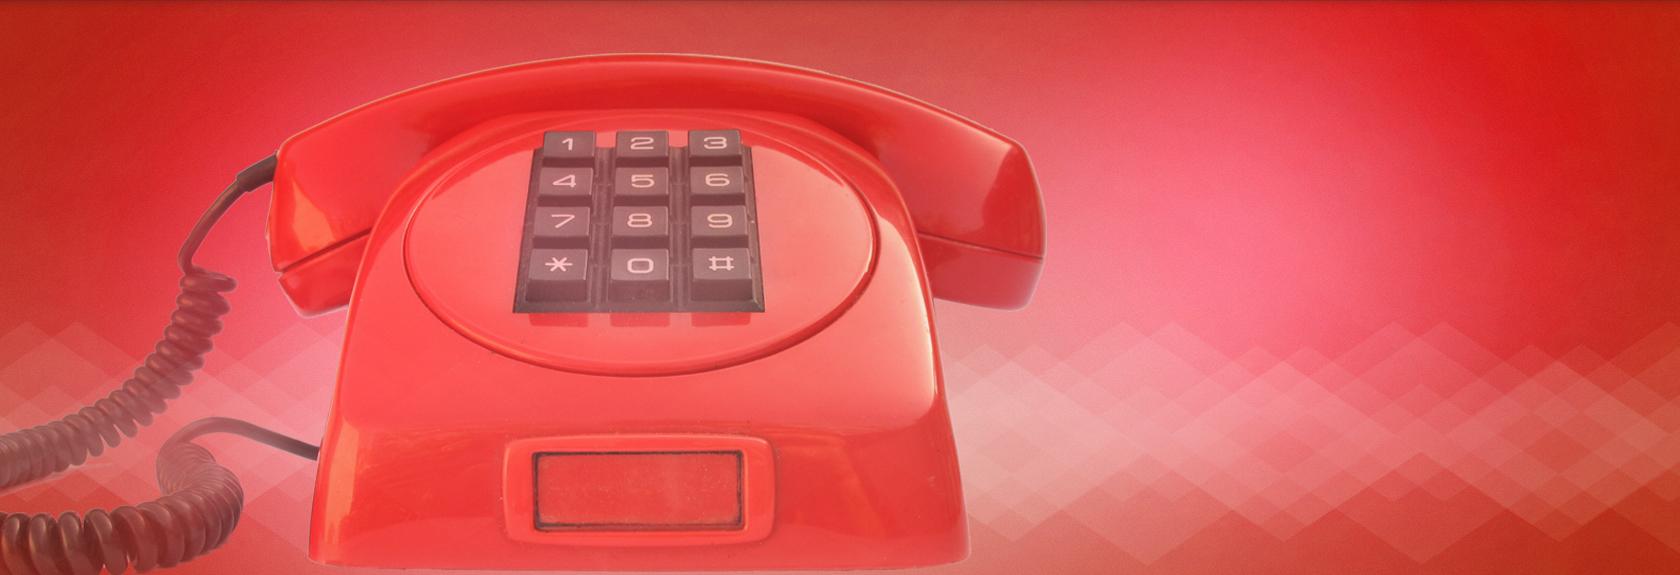 Estafa telefónica